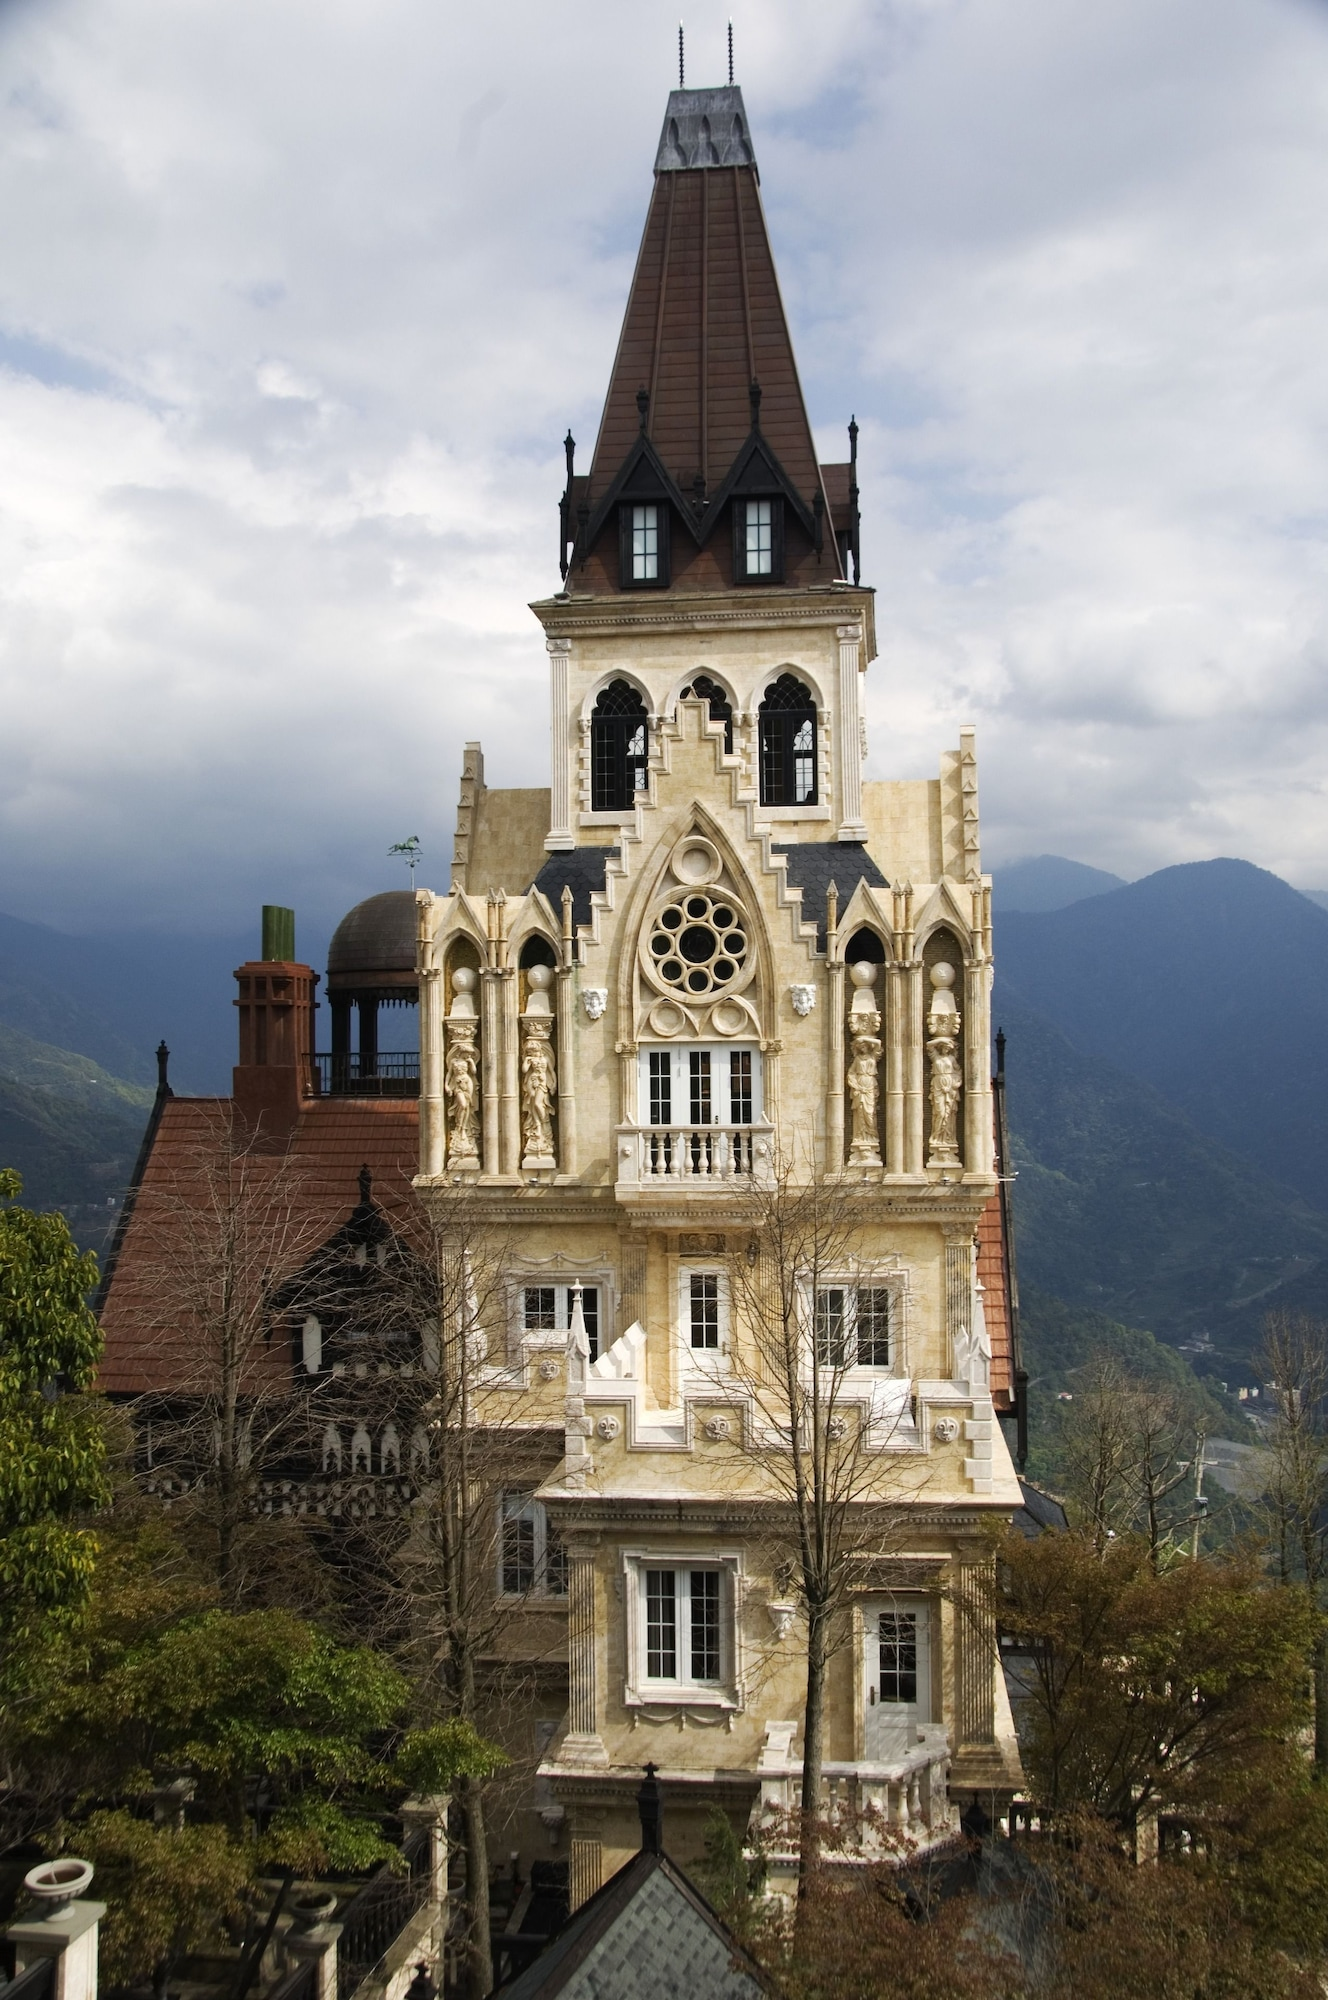 The Old England Manor, Nantou